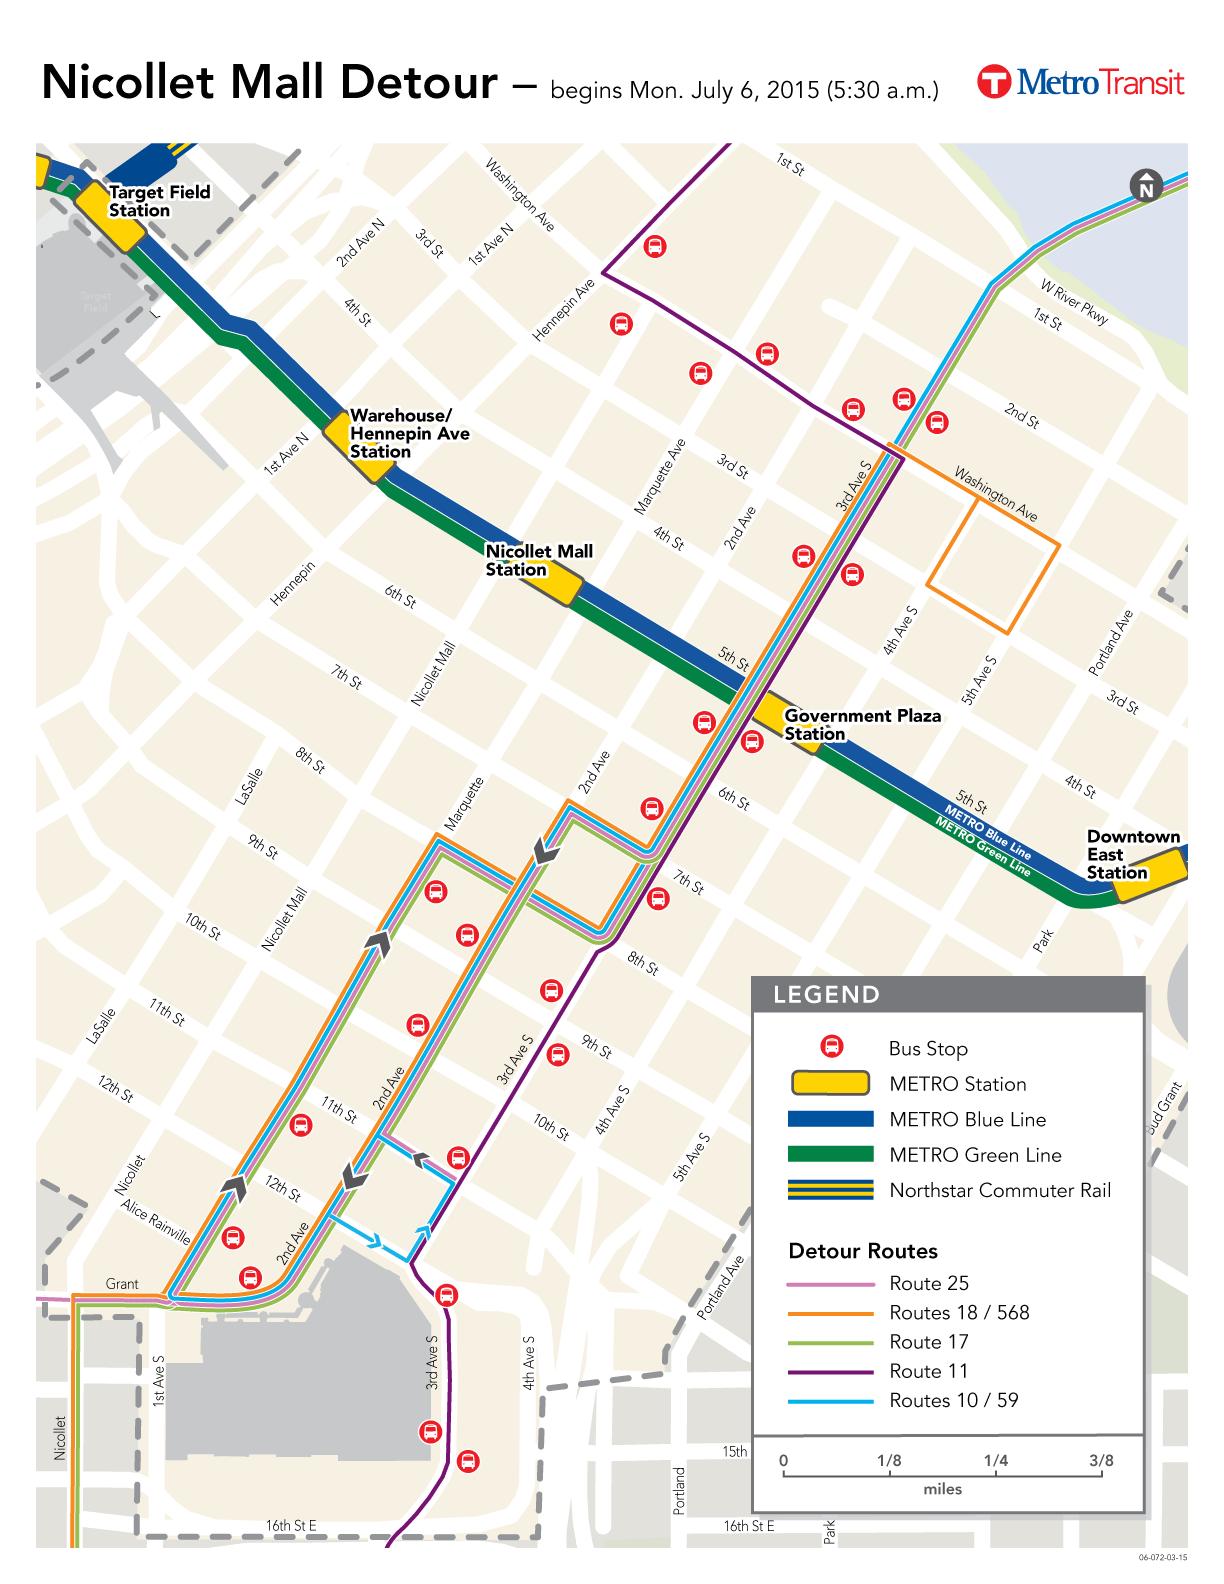 Map Of Metro Transit Bus Detours During Nicollet Mall Construction